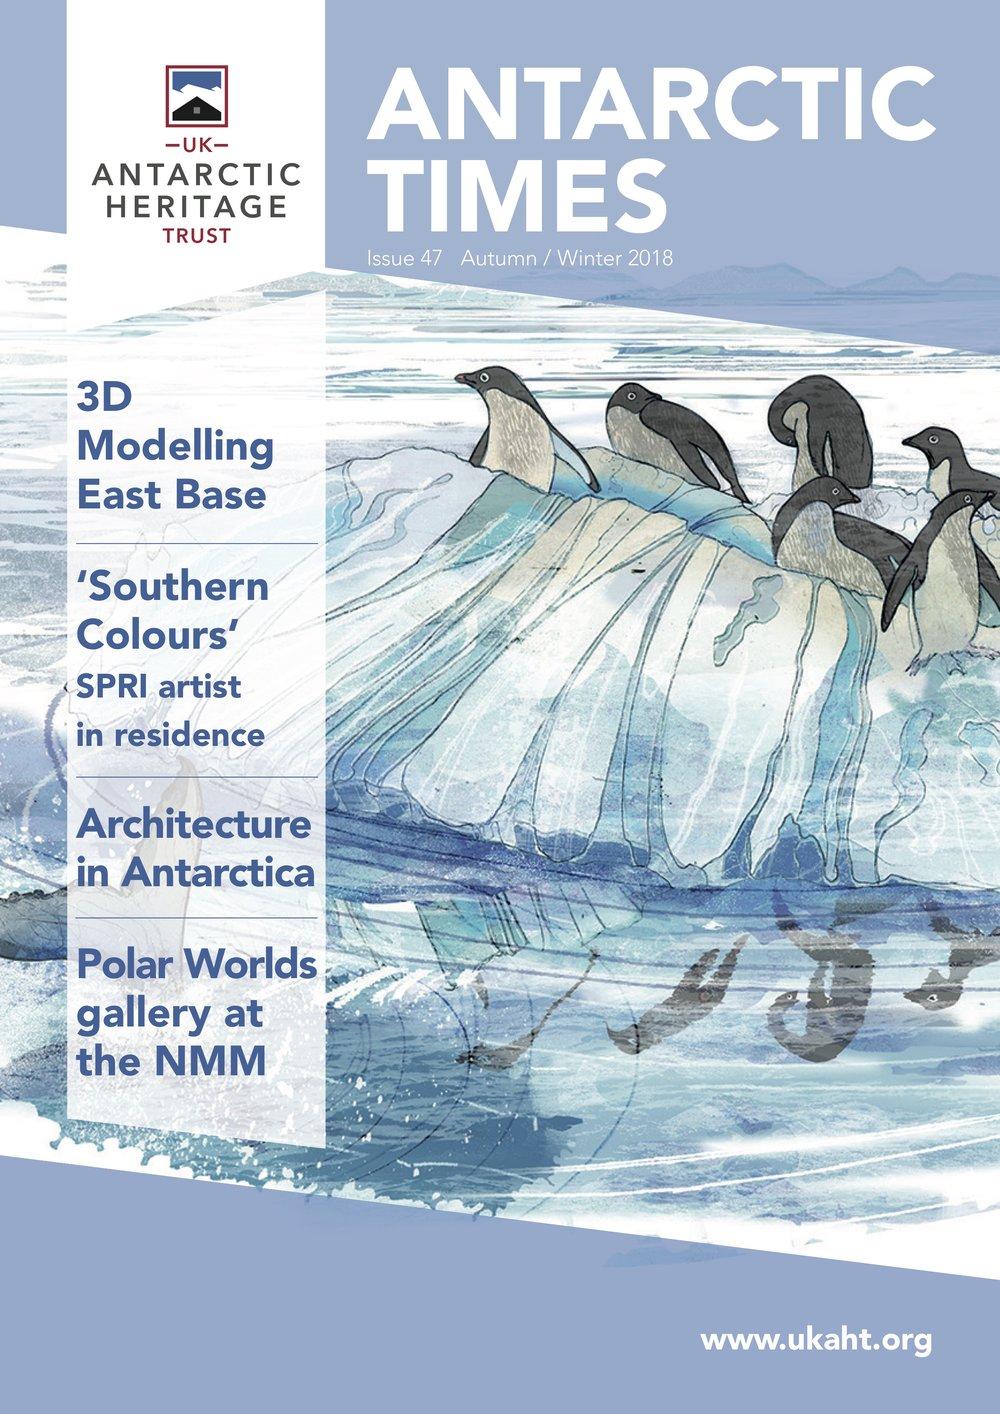 AHT Antarctctic Times_Winter 2018_19.jpg